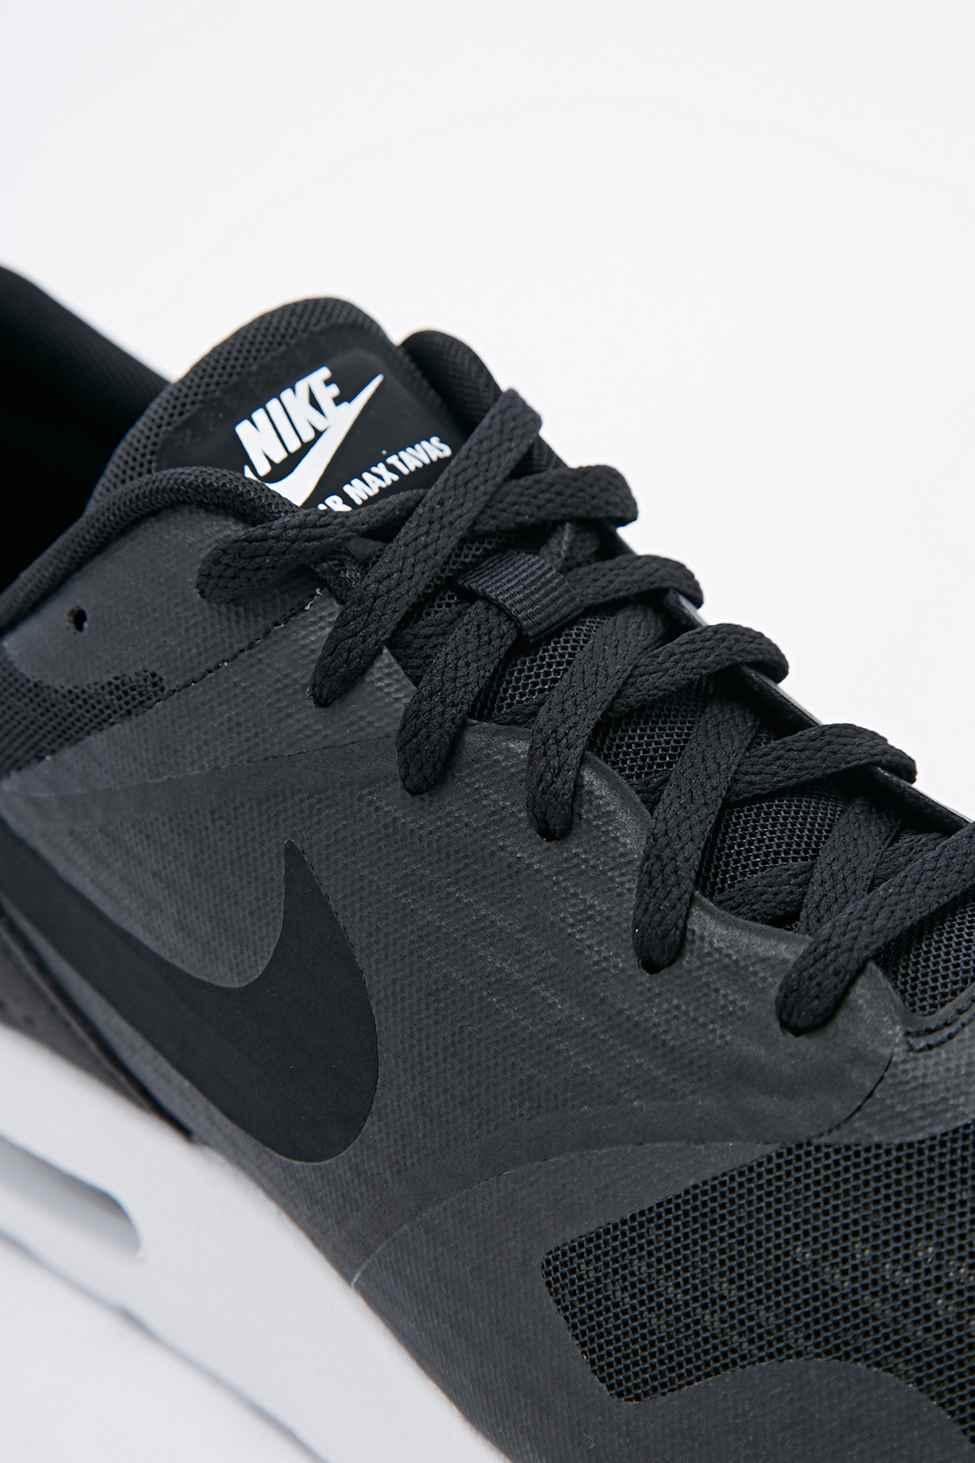 804184bce35ba4 Nike Air Max Tavas Essential Trainers Black leoncamier.co.uk